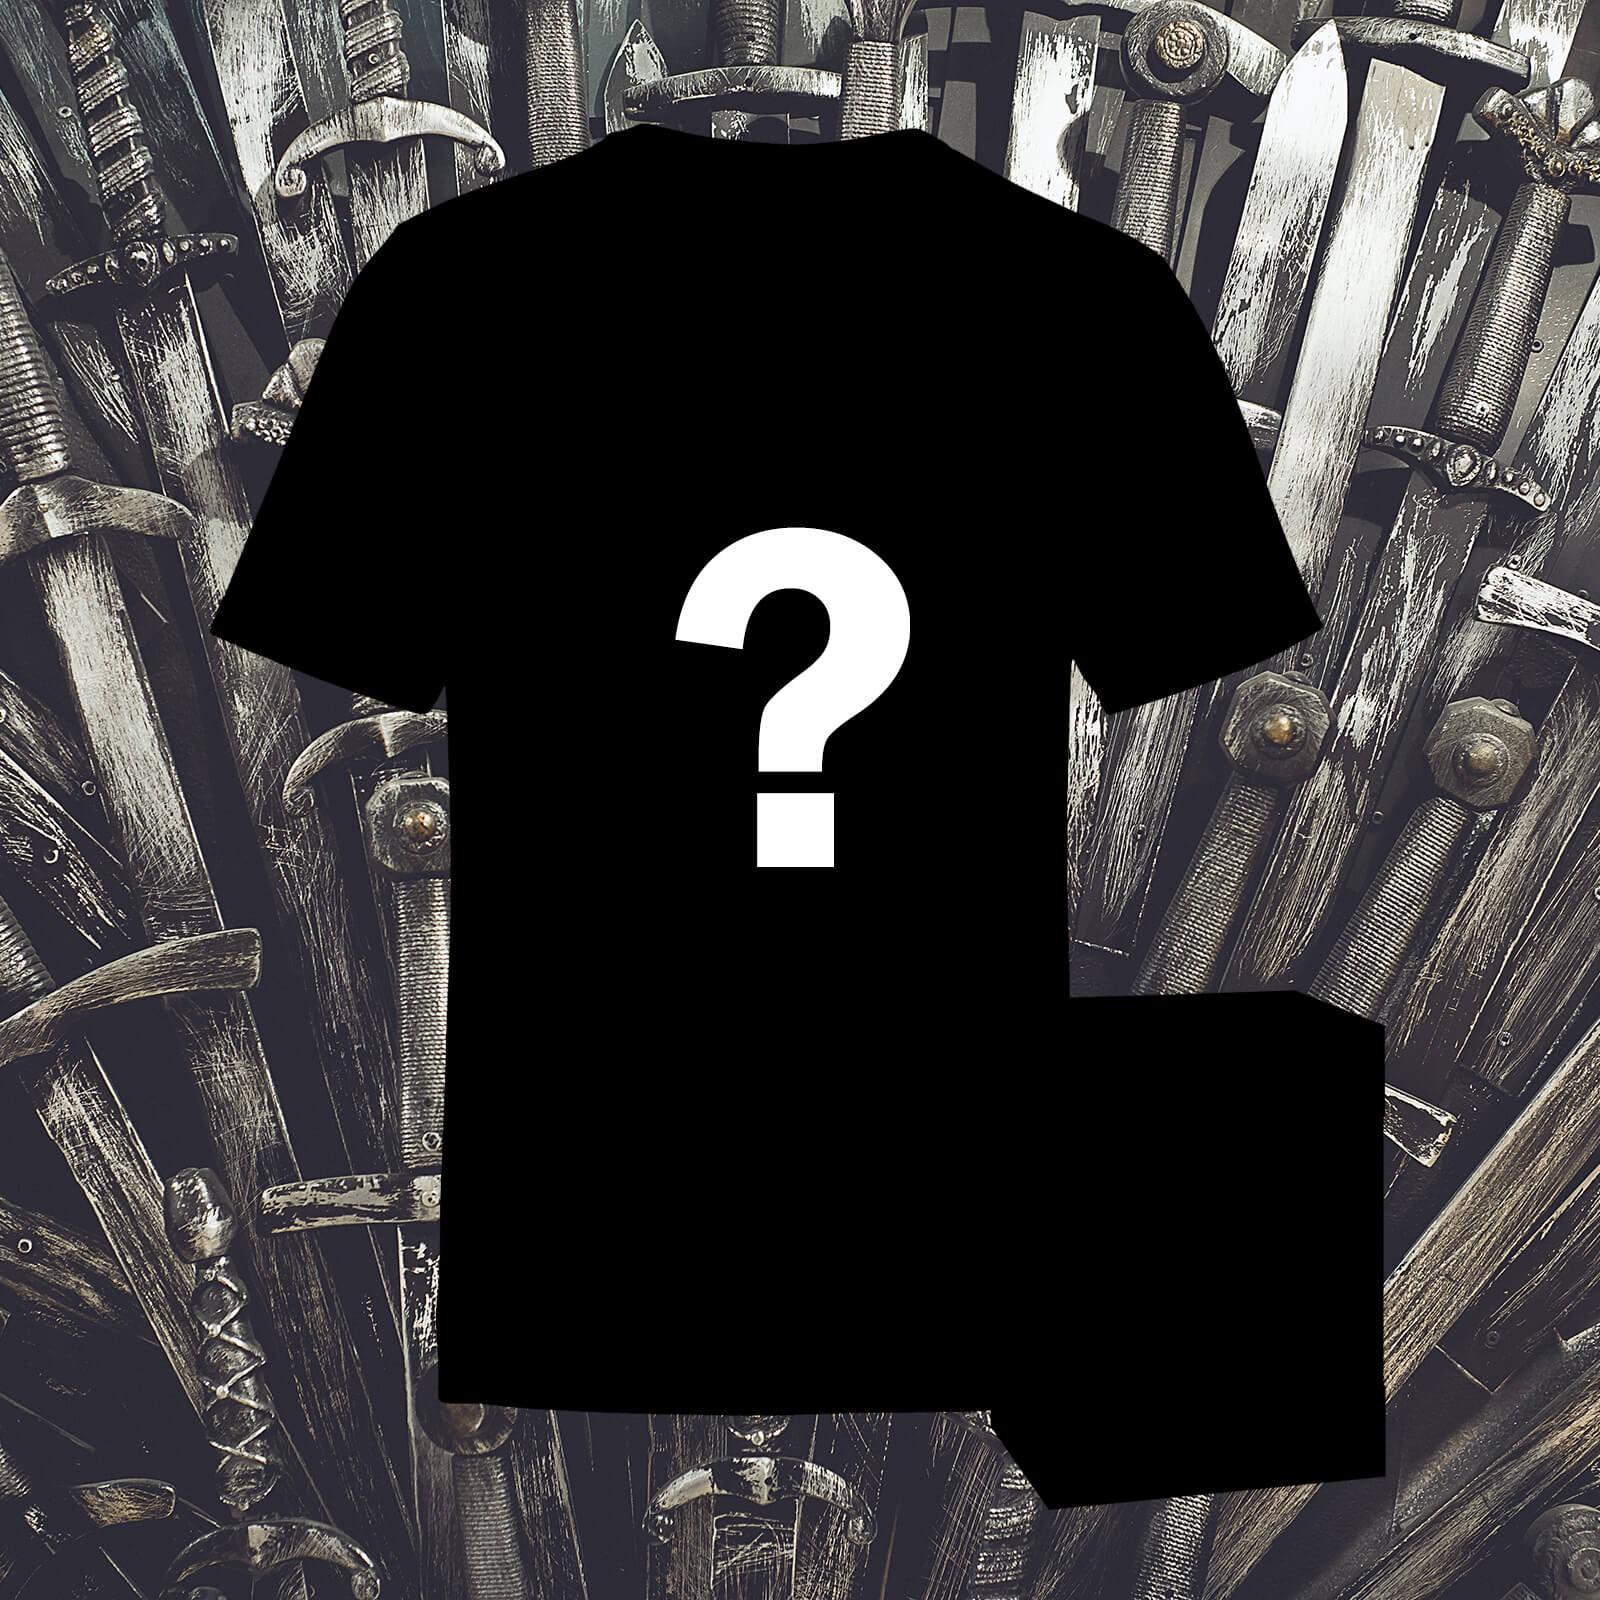 Game Of Thrones finale bundle. T-shirt and Pop vinyl figure - £14.99 @ Zavvi